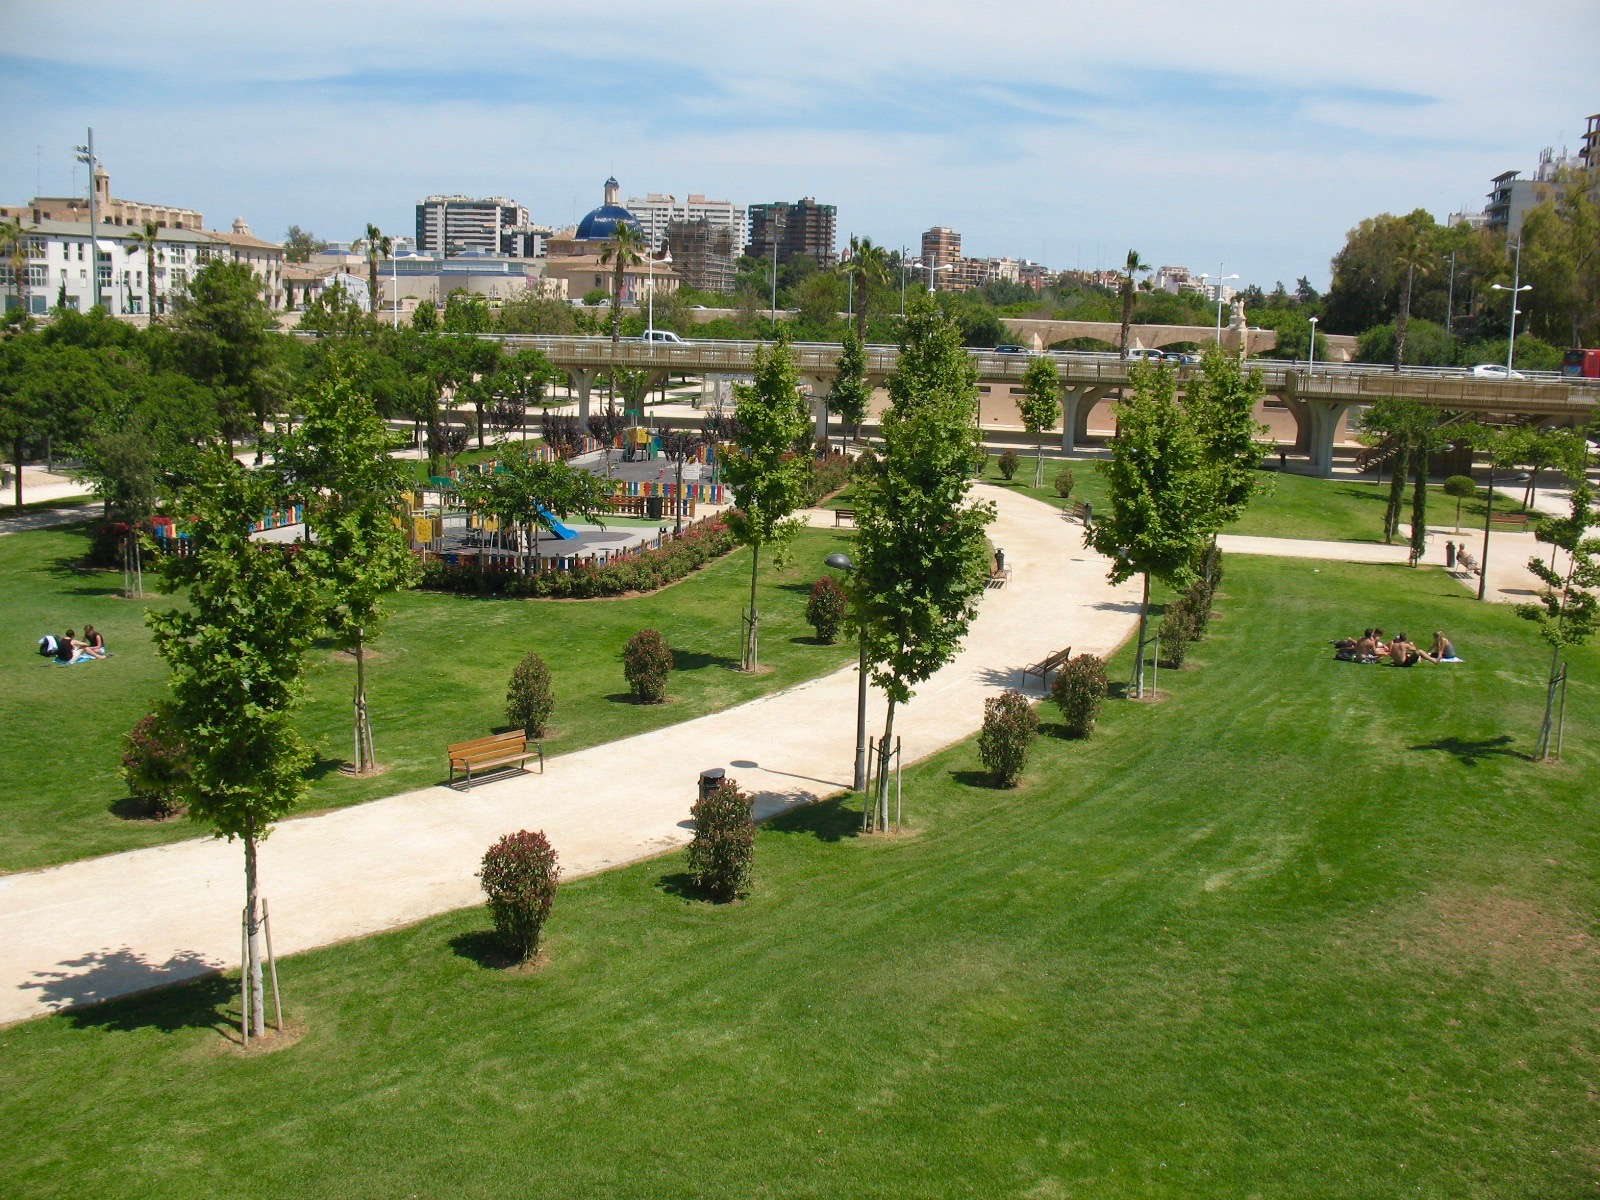 Jardin del turia - Ogrody Turii